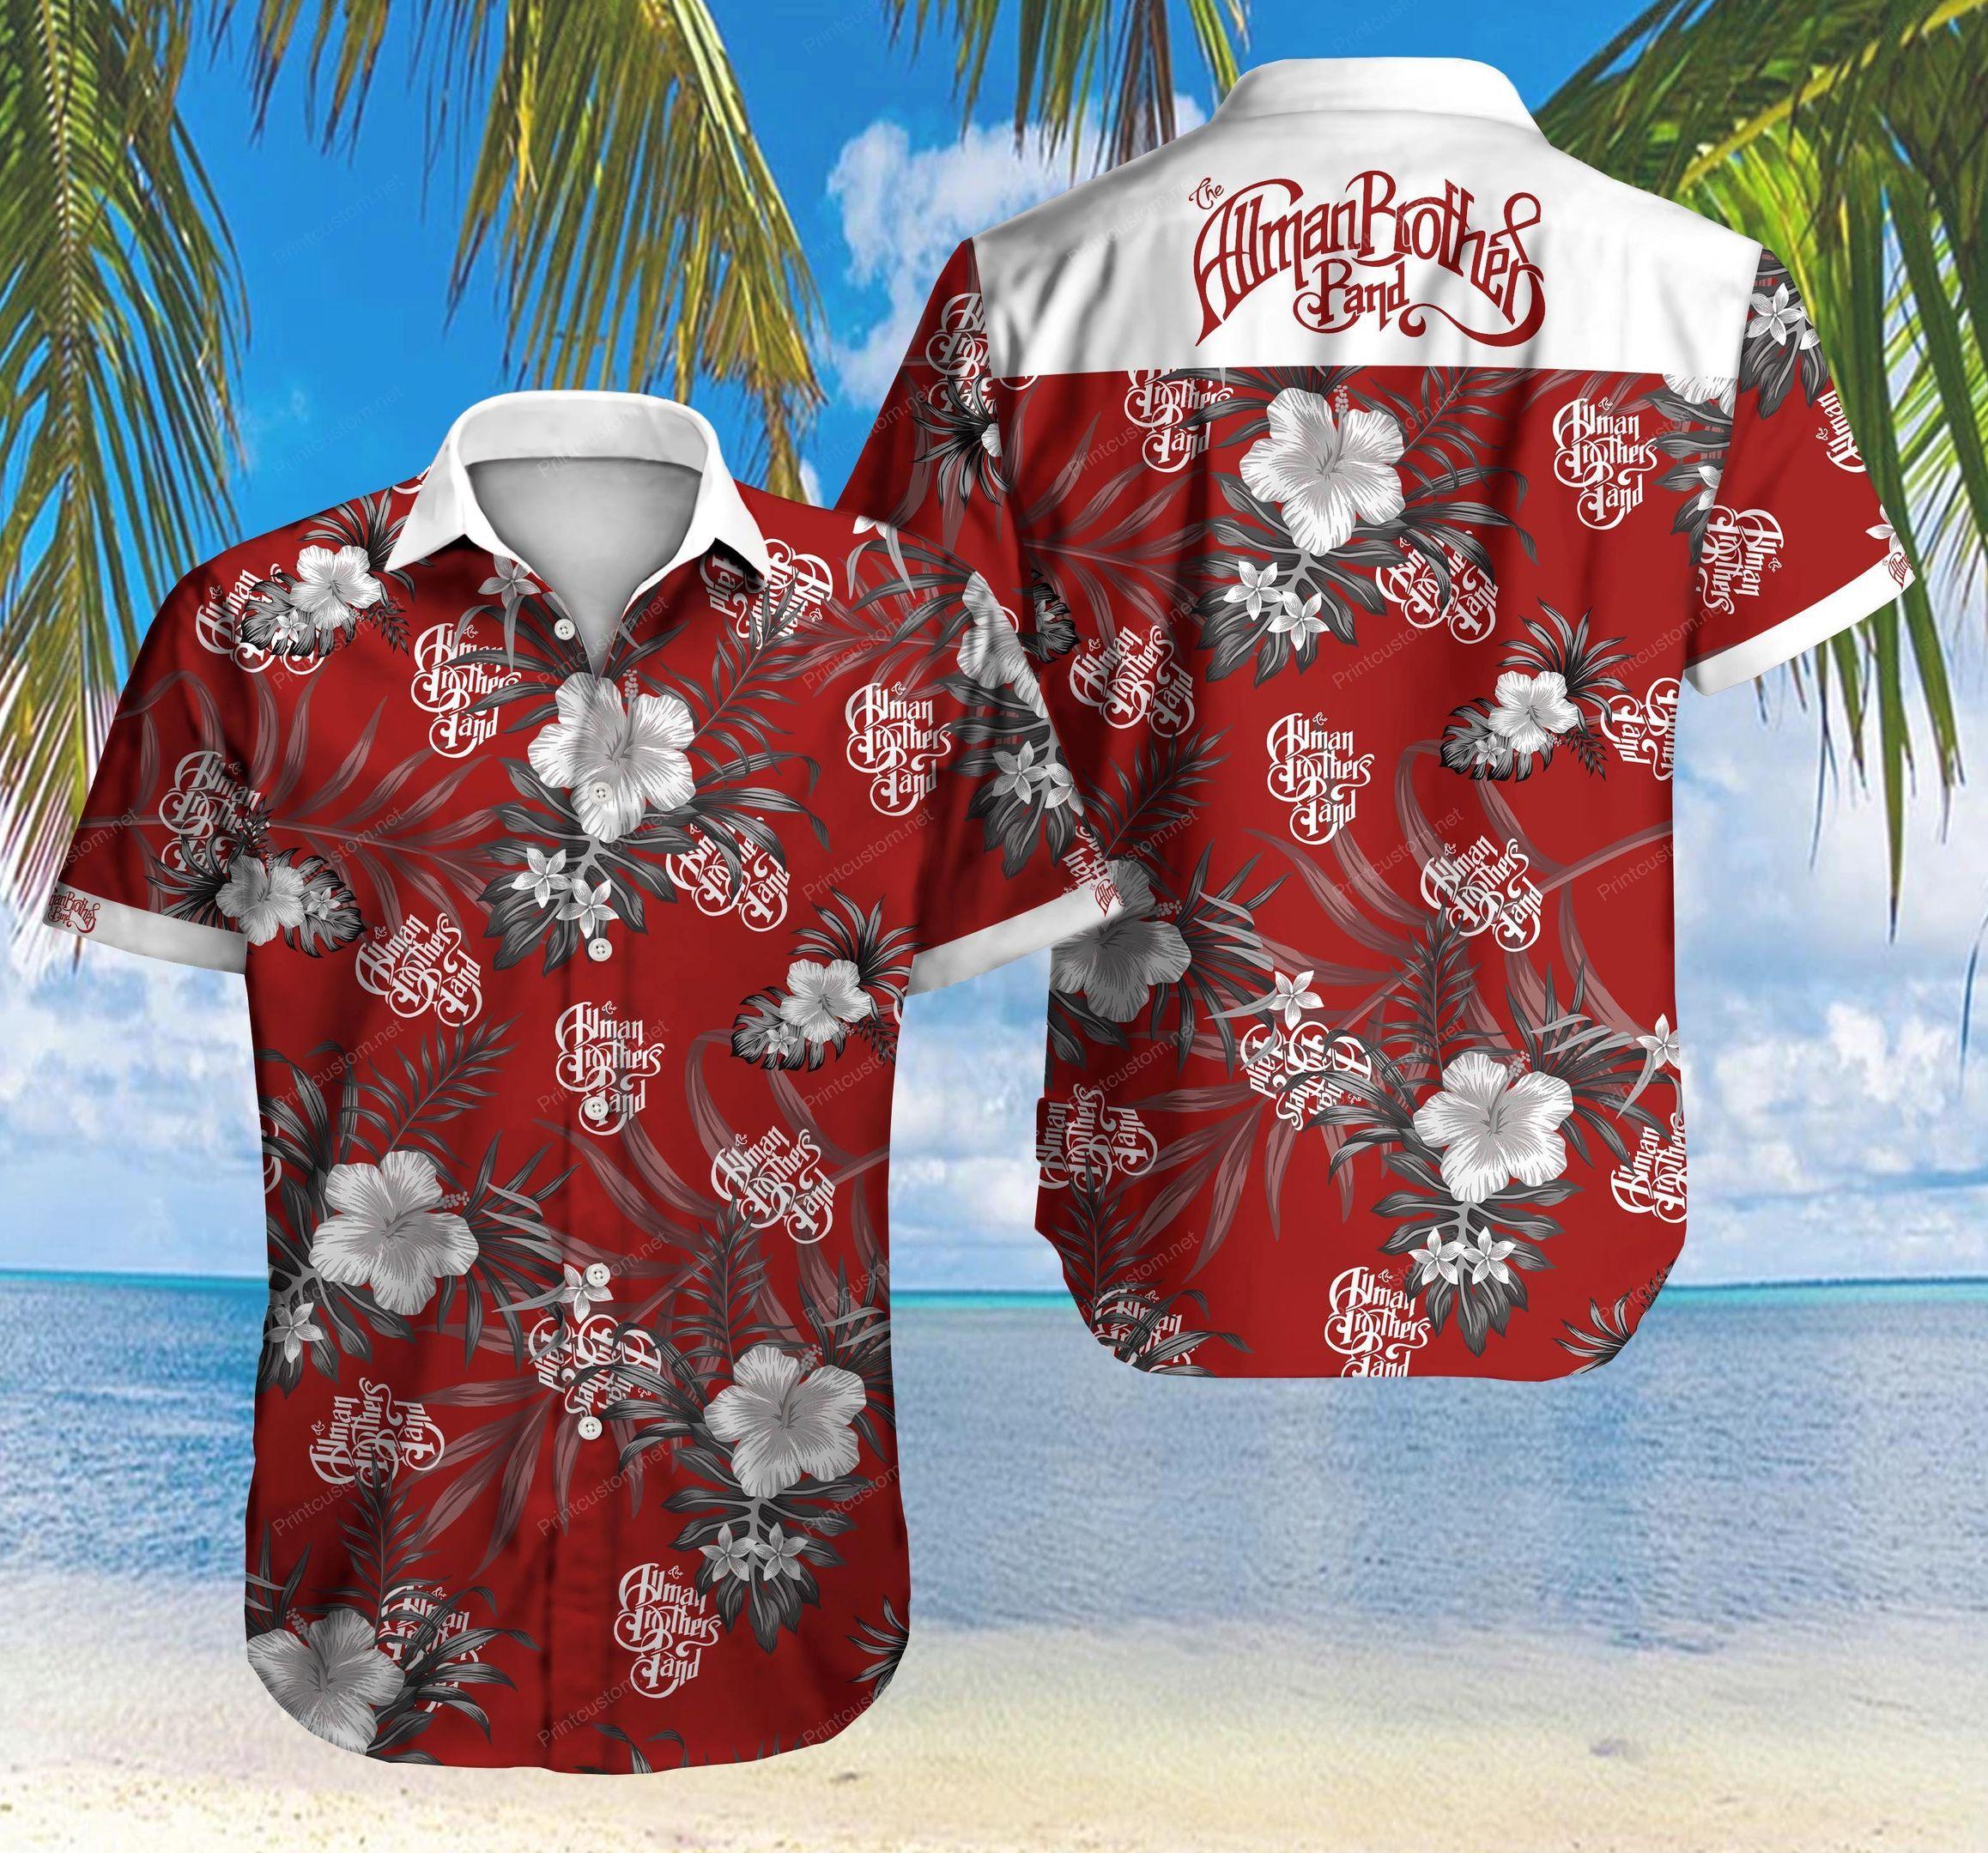 The Allman Brother Band Hawaii Shirt Summer